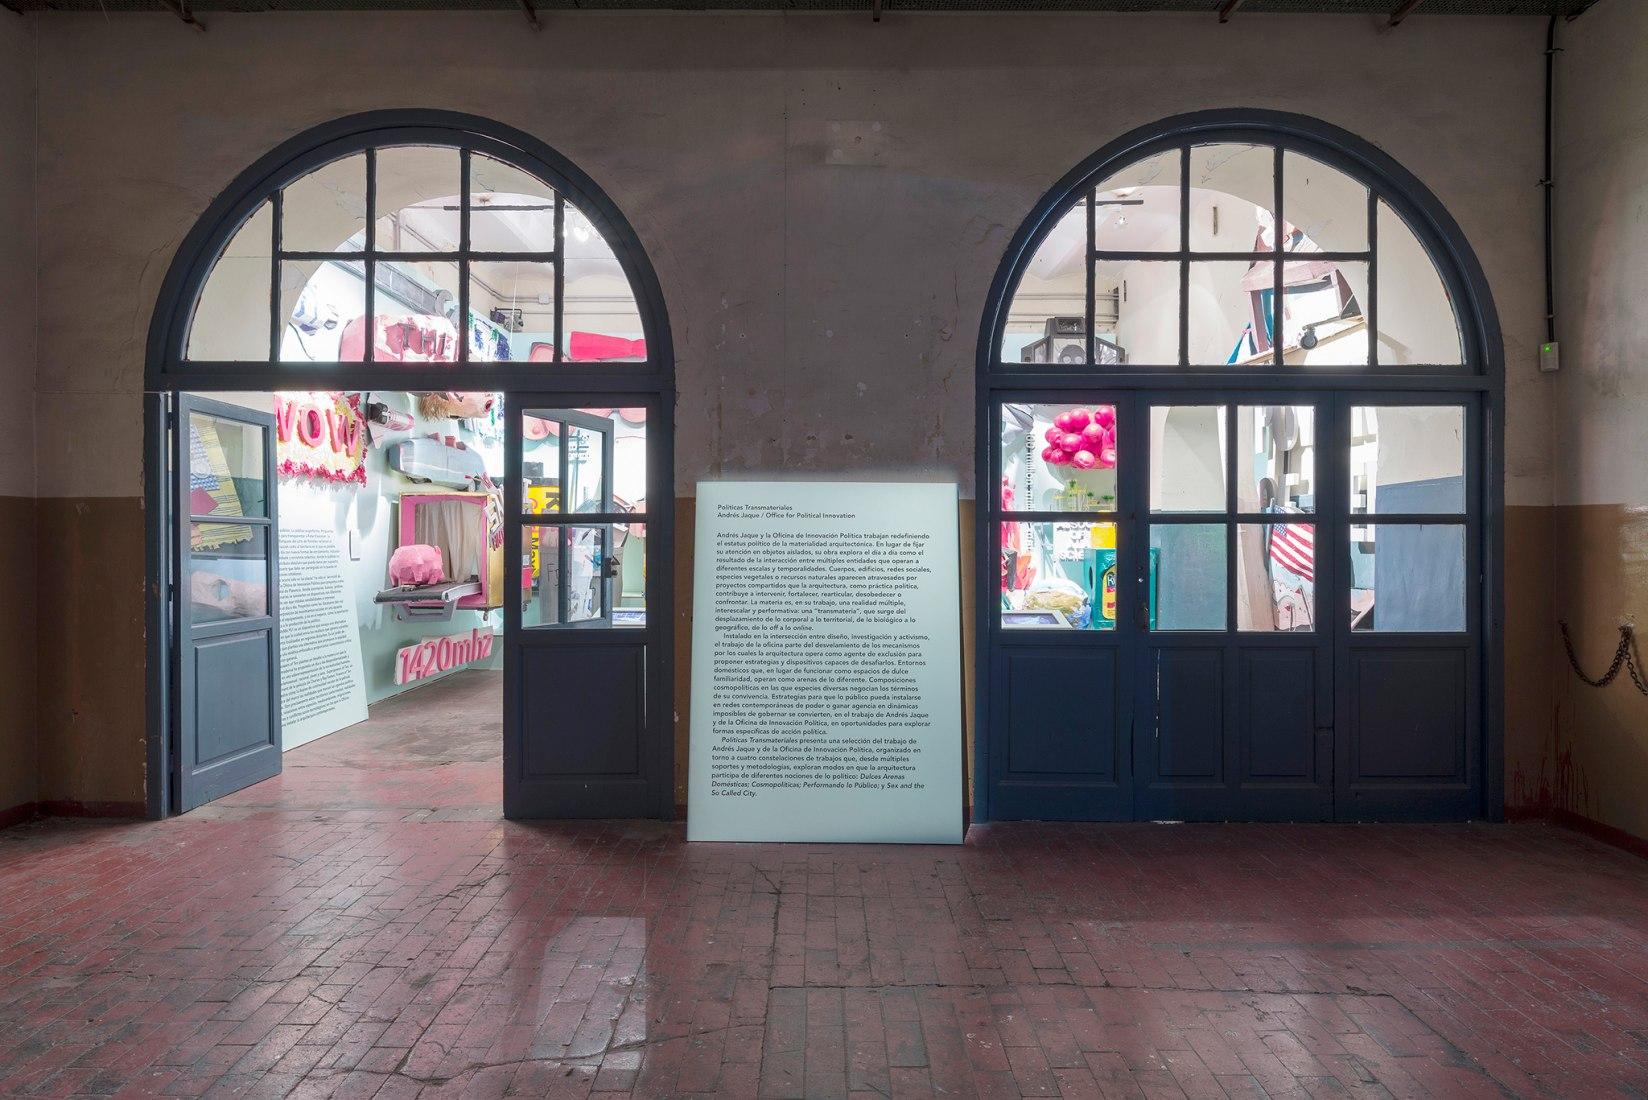 """Políticas Transmateriales. Andrés Jaque / Office for Political Innovation."" Imagen cortesía de Andrés Jaque Architects."